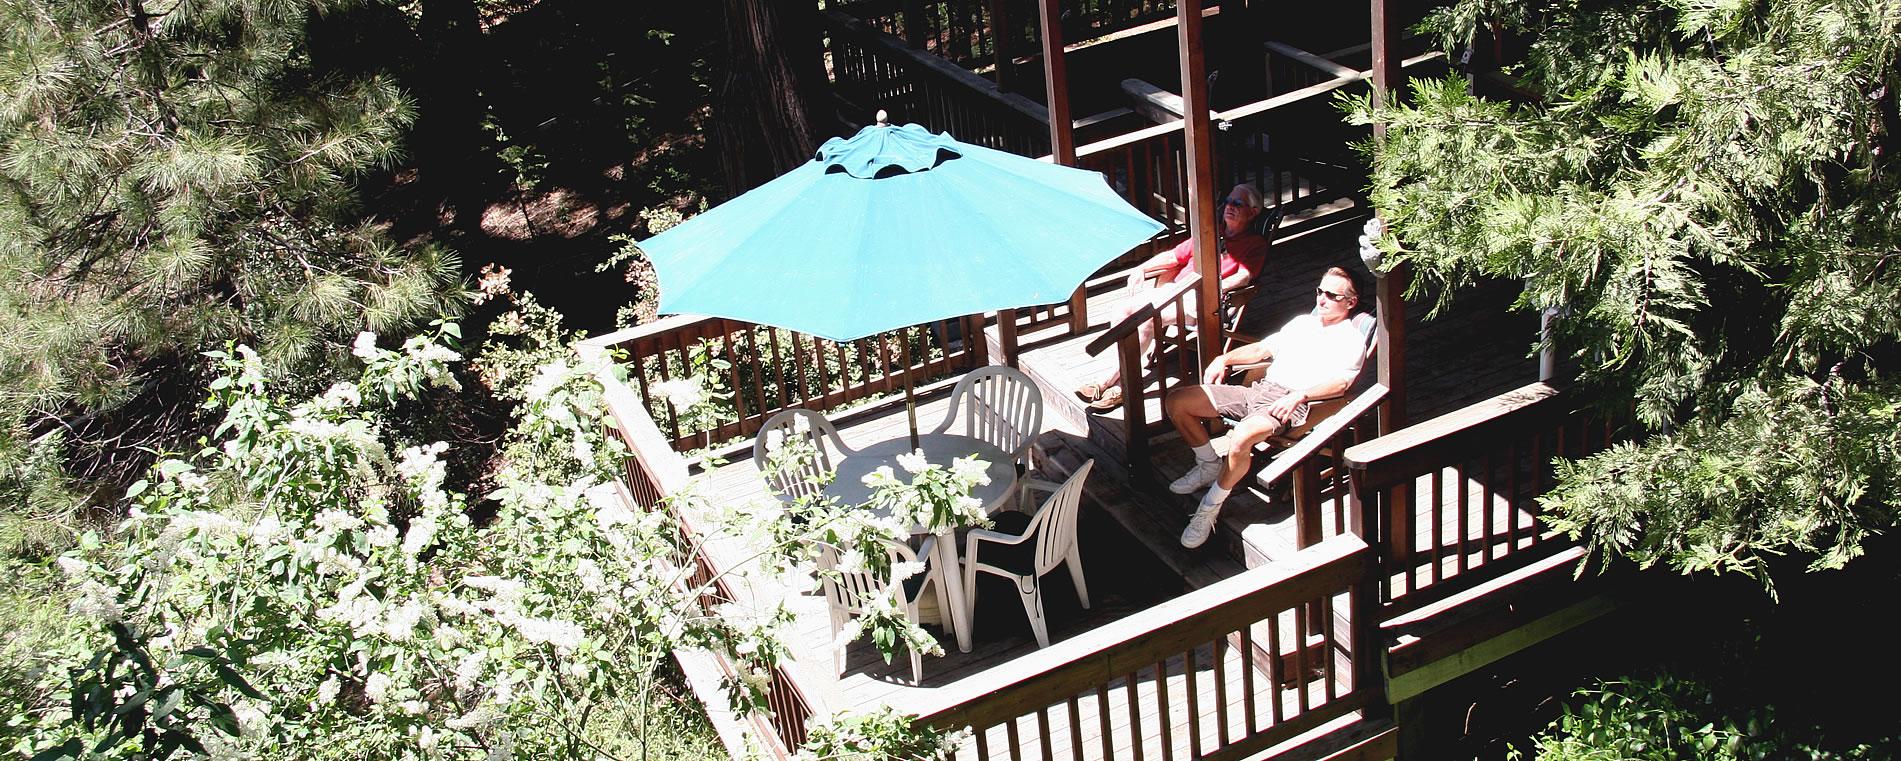 mccafrey-house-bed-breakfast-sundeck